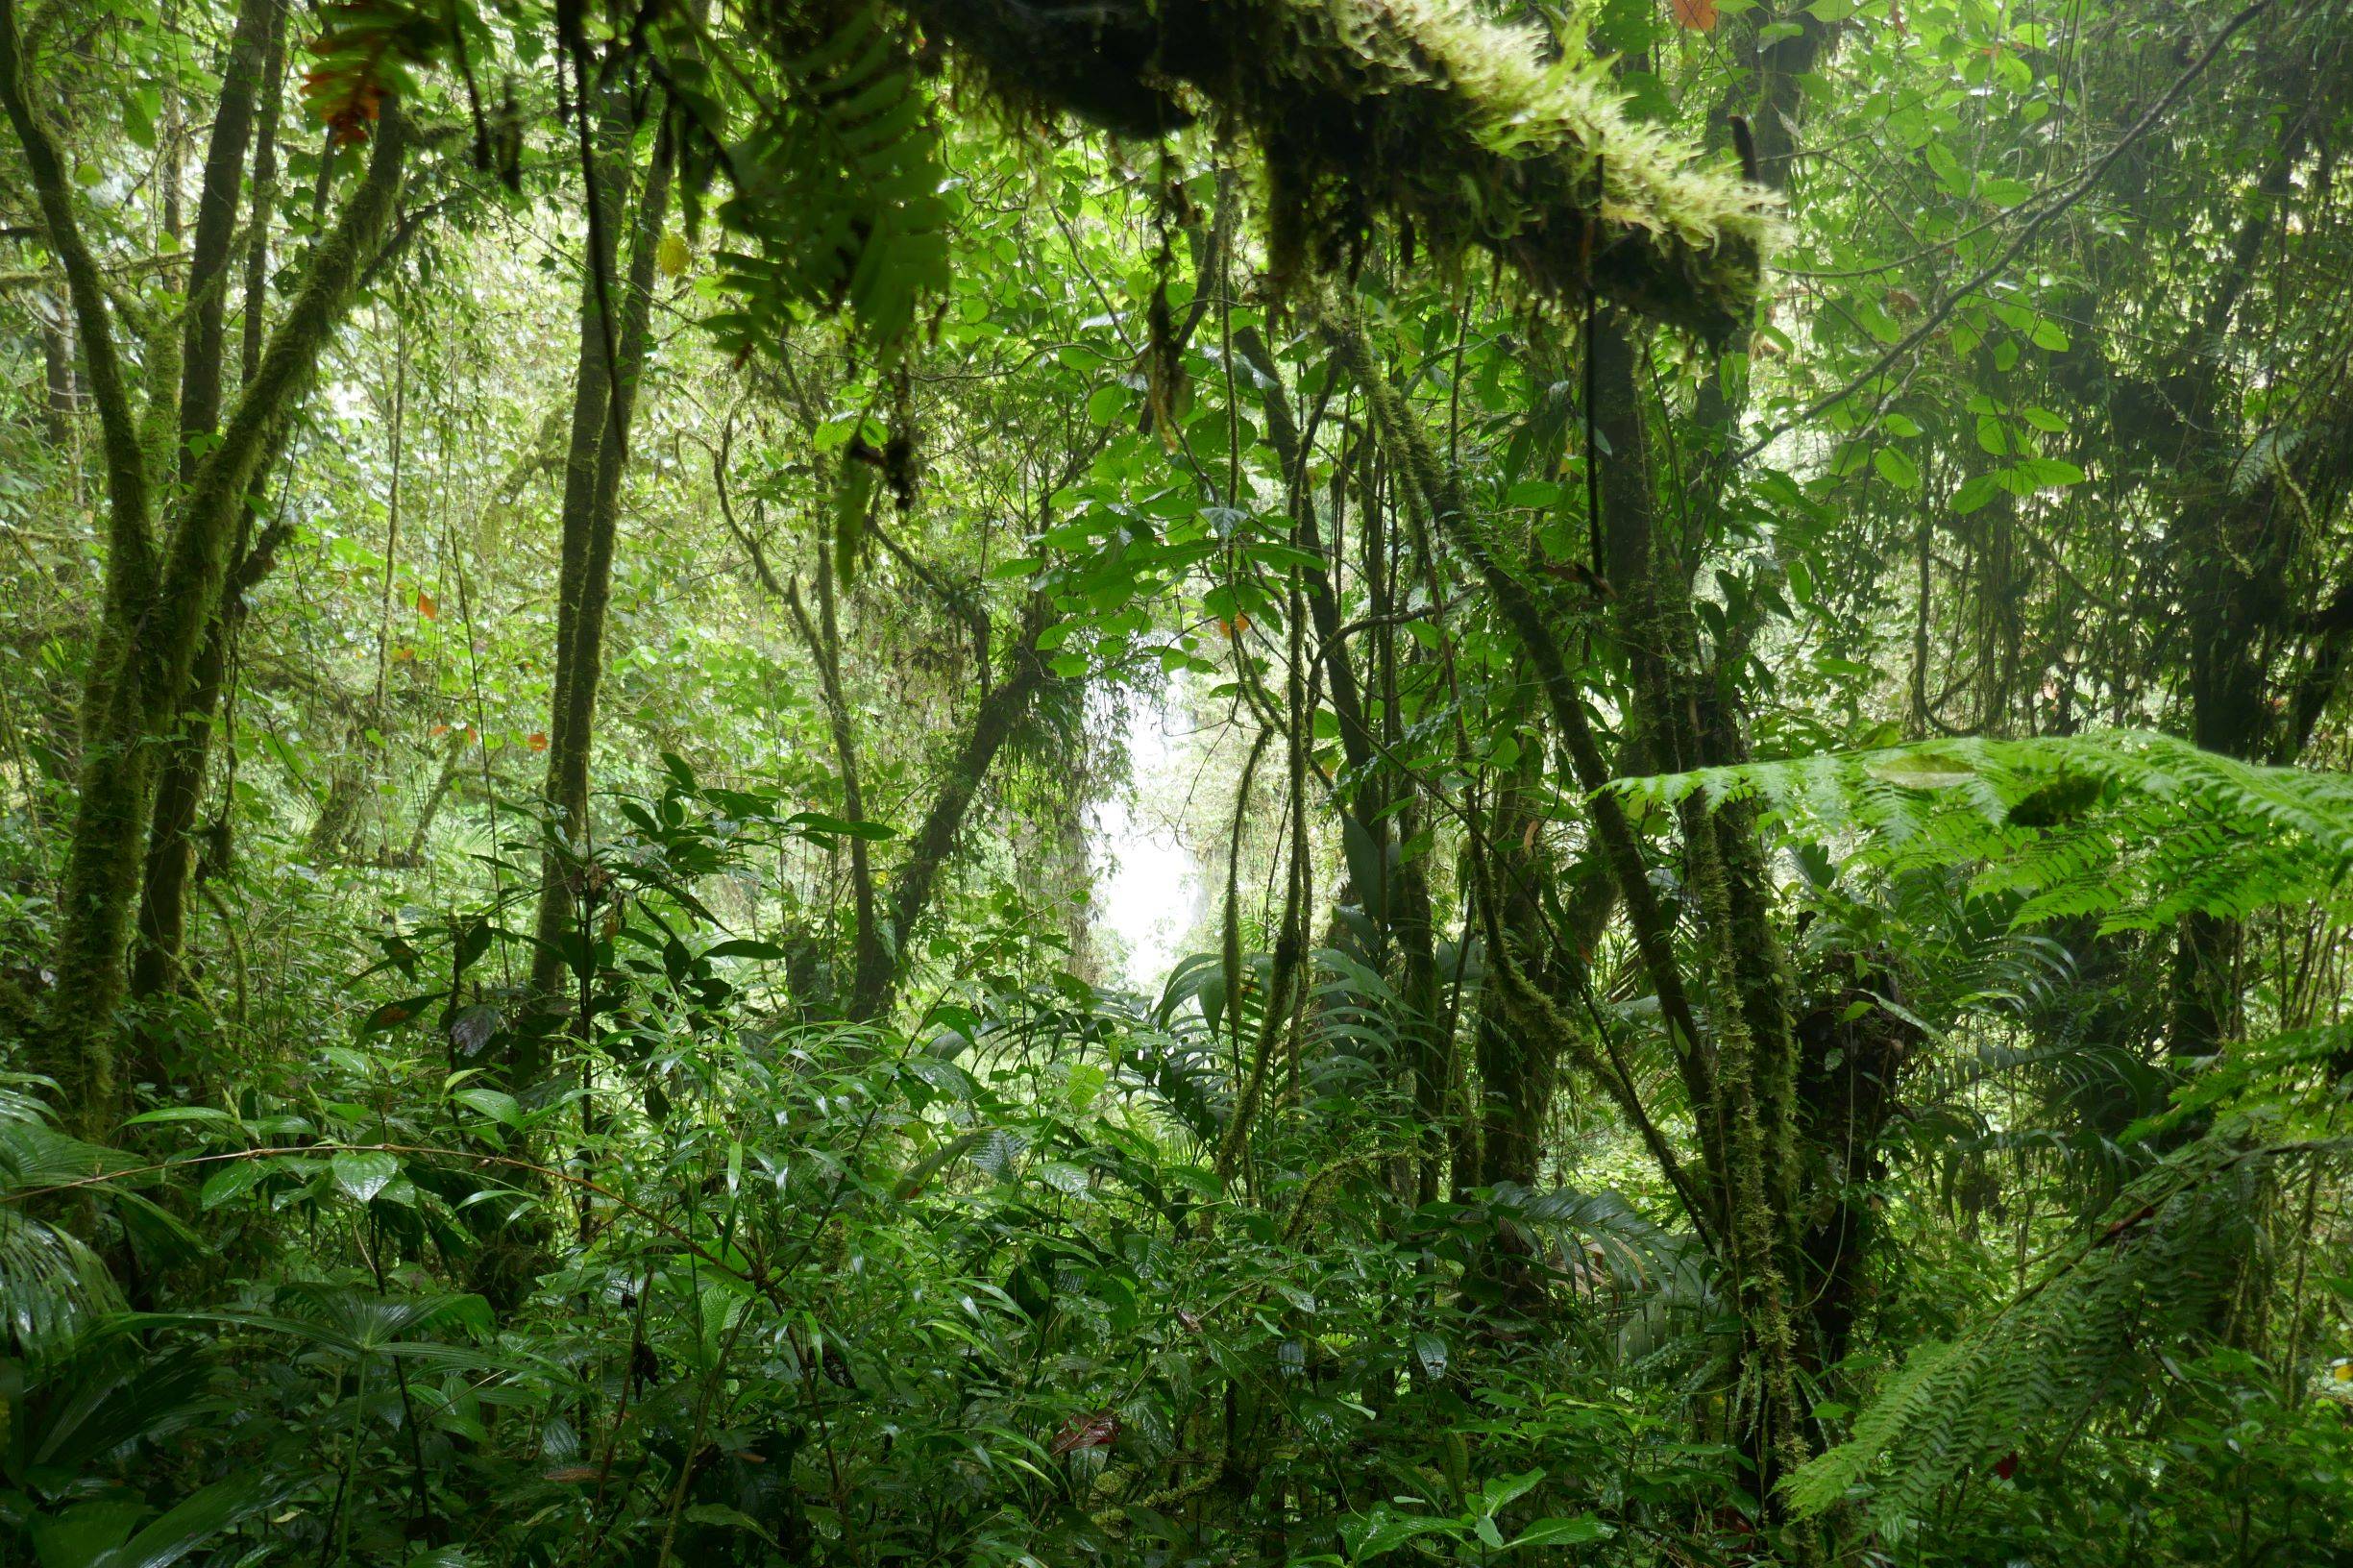 foret humide panama Le blog du voyage en famille